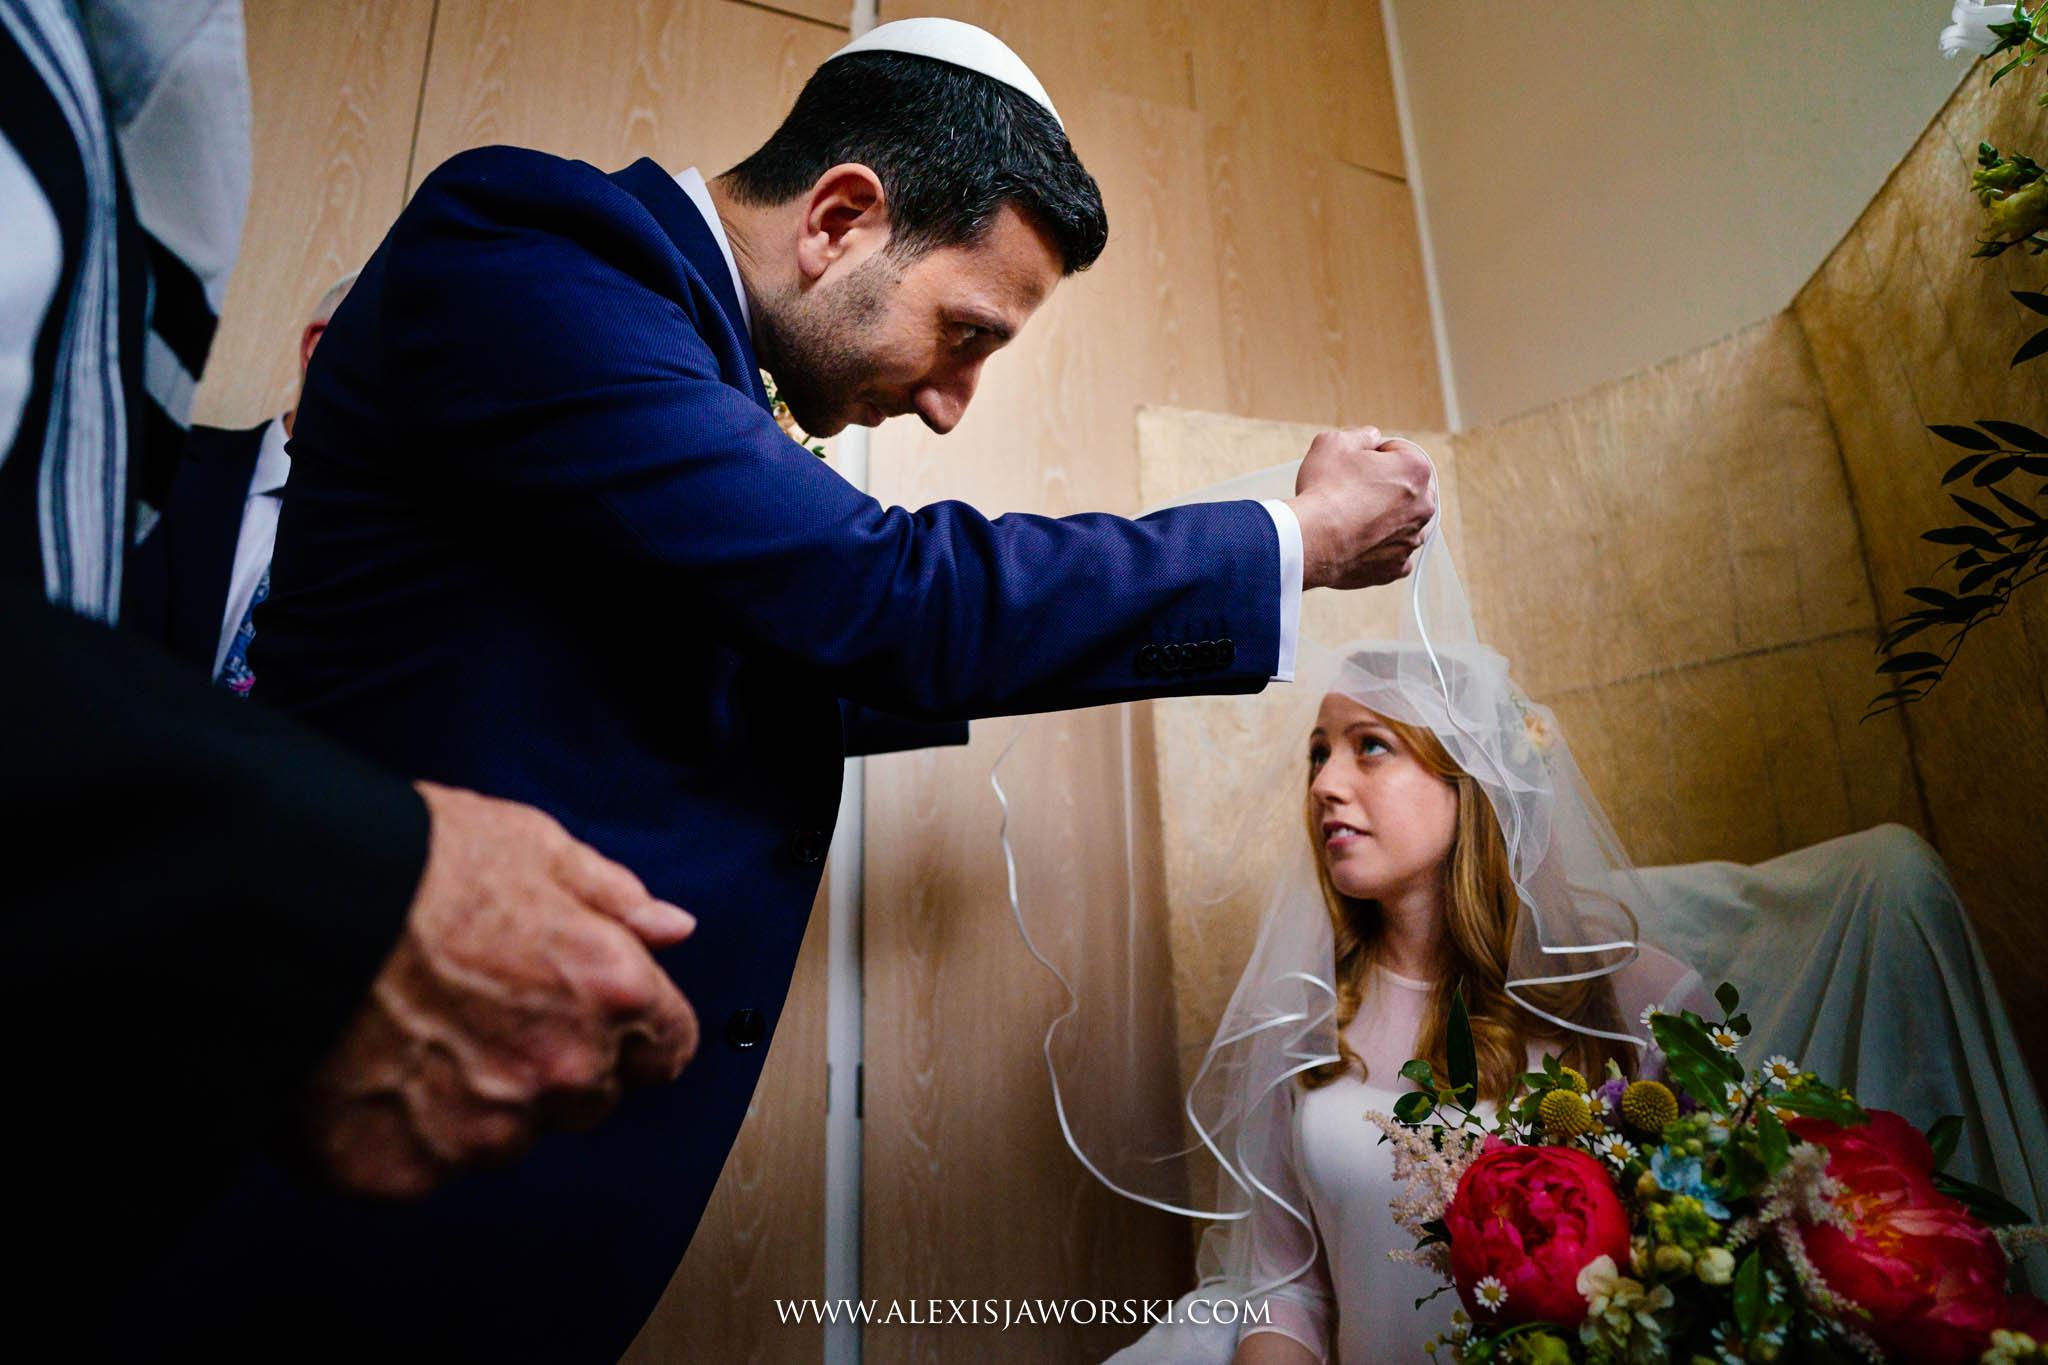 Groom lifting bride's veil